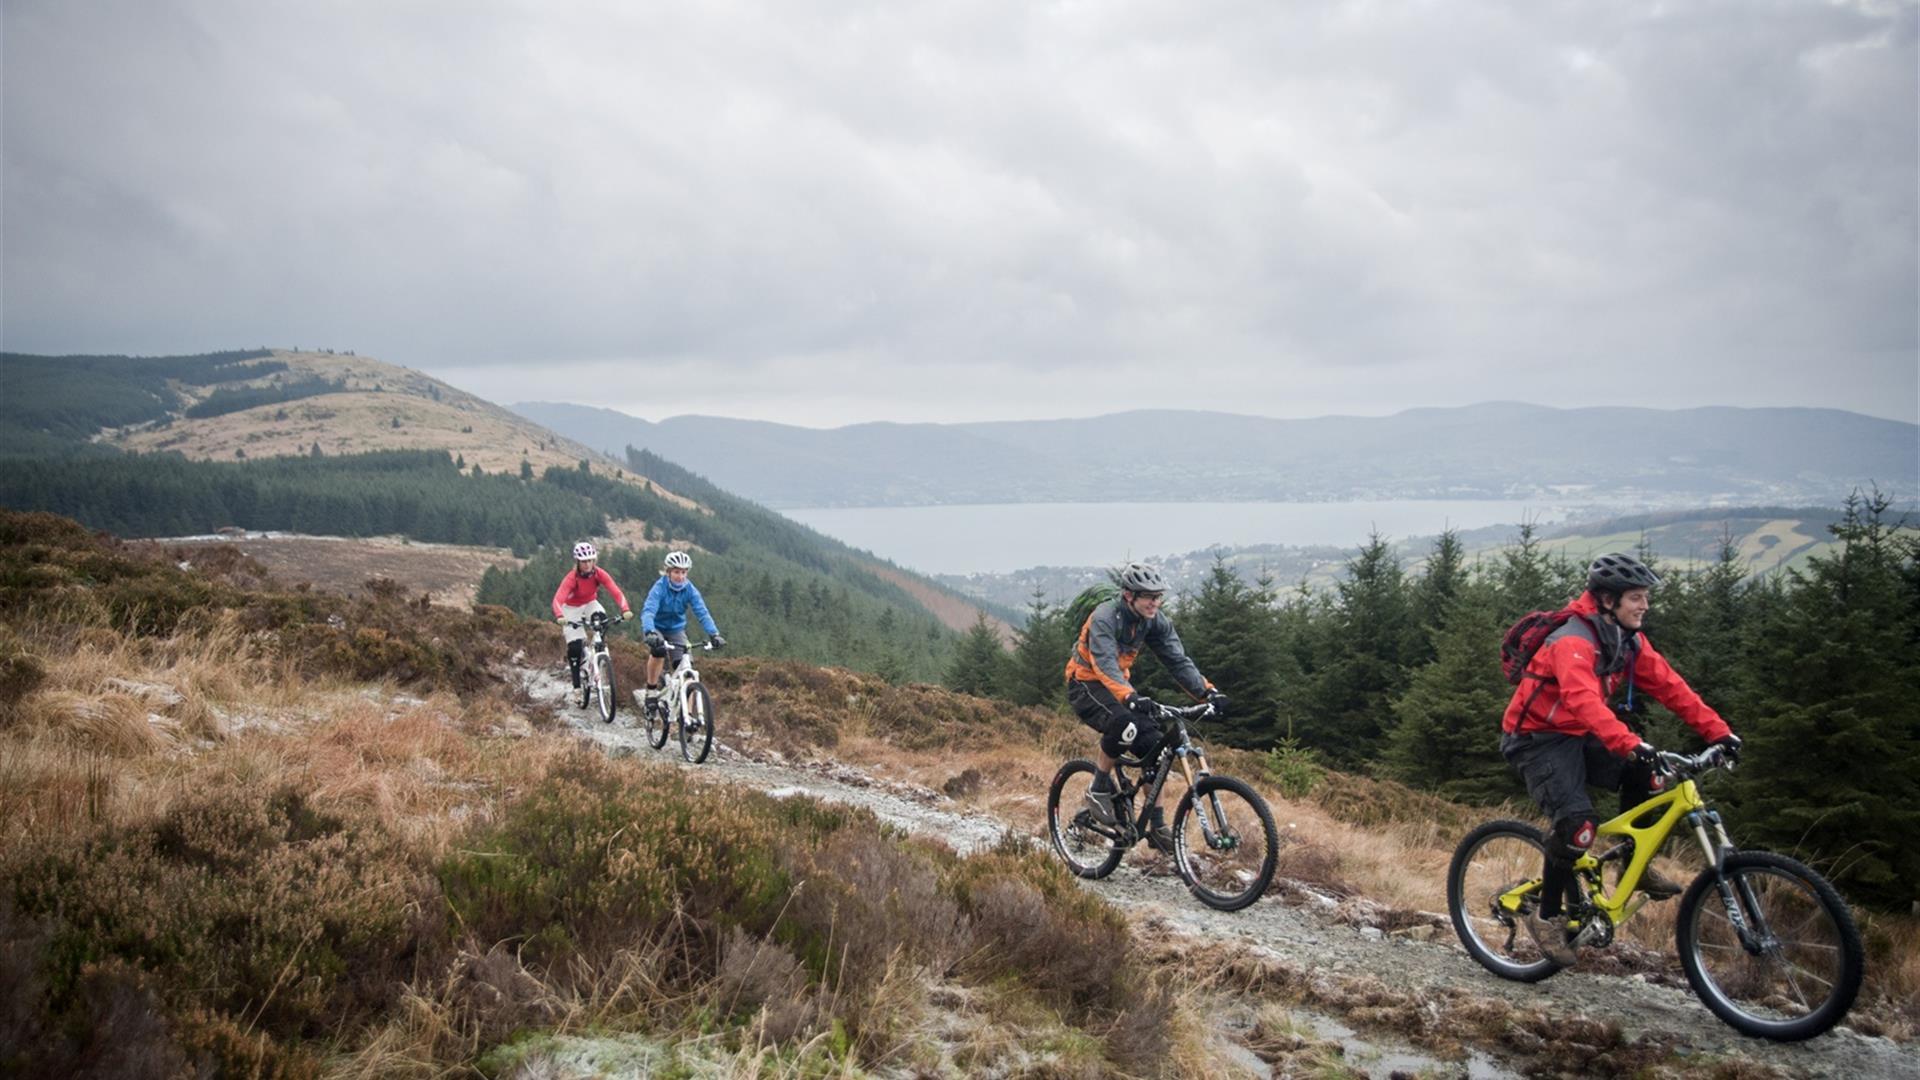 Rostrevor Mountain Bike Trails